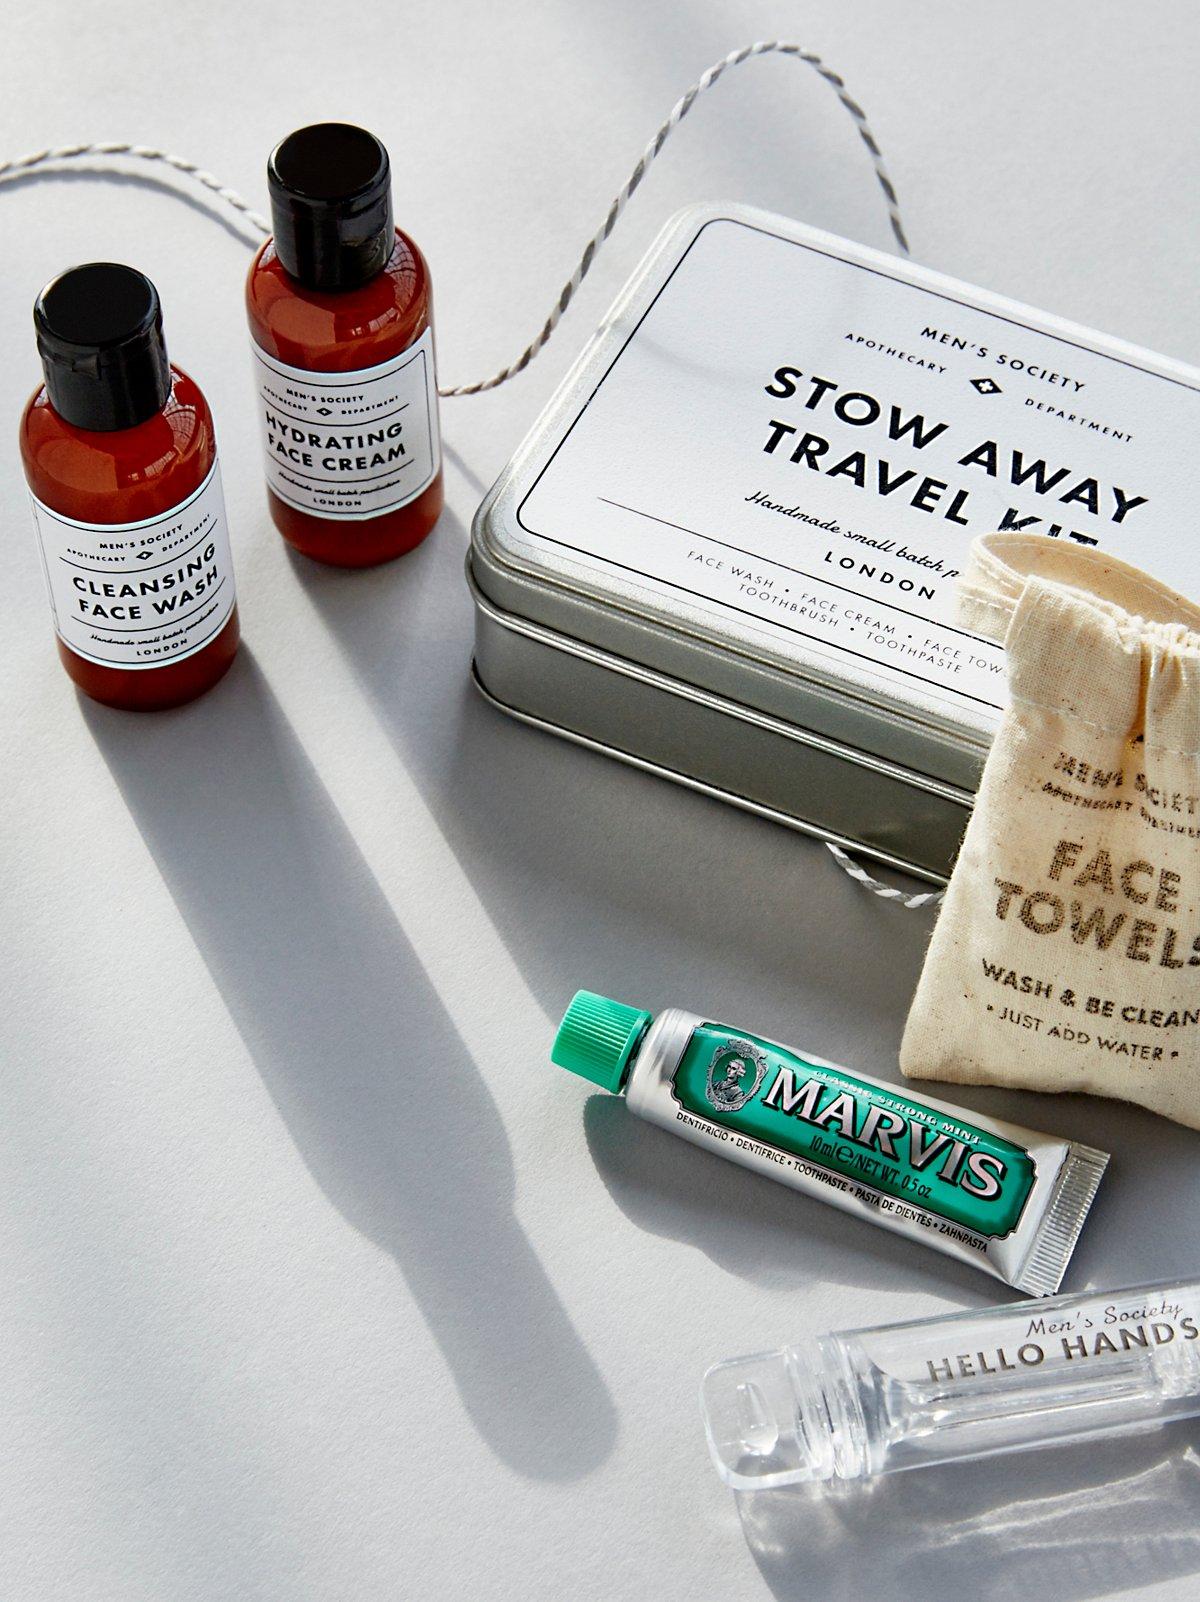 Stow Away旅行套装